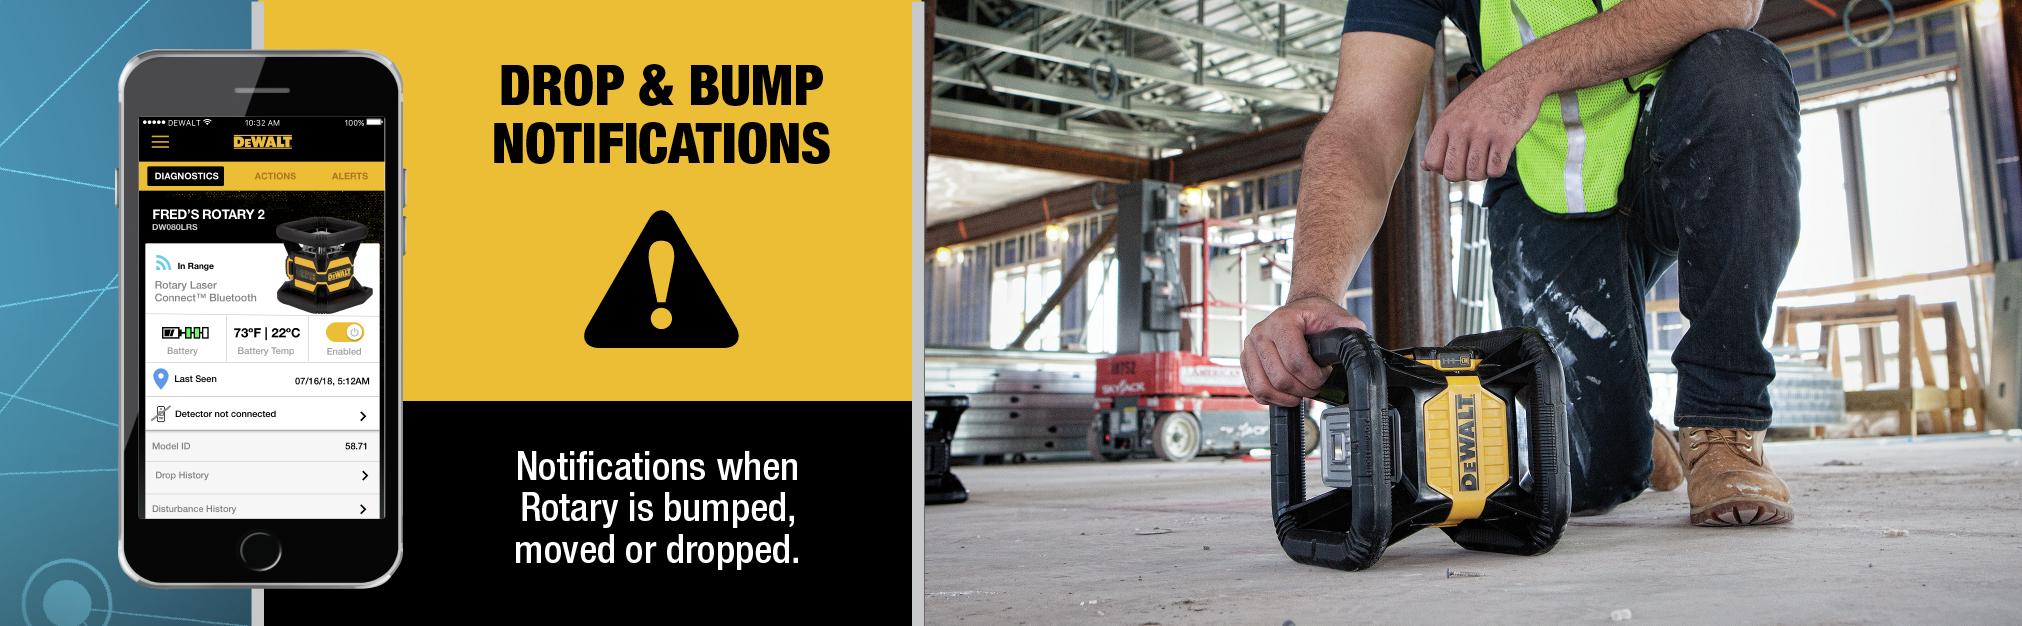 Drop and Bump Notifications